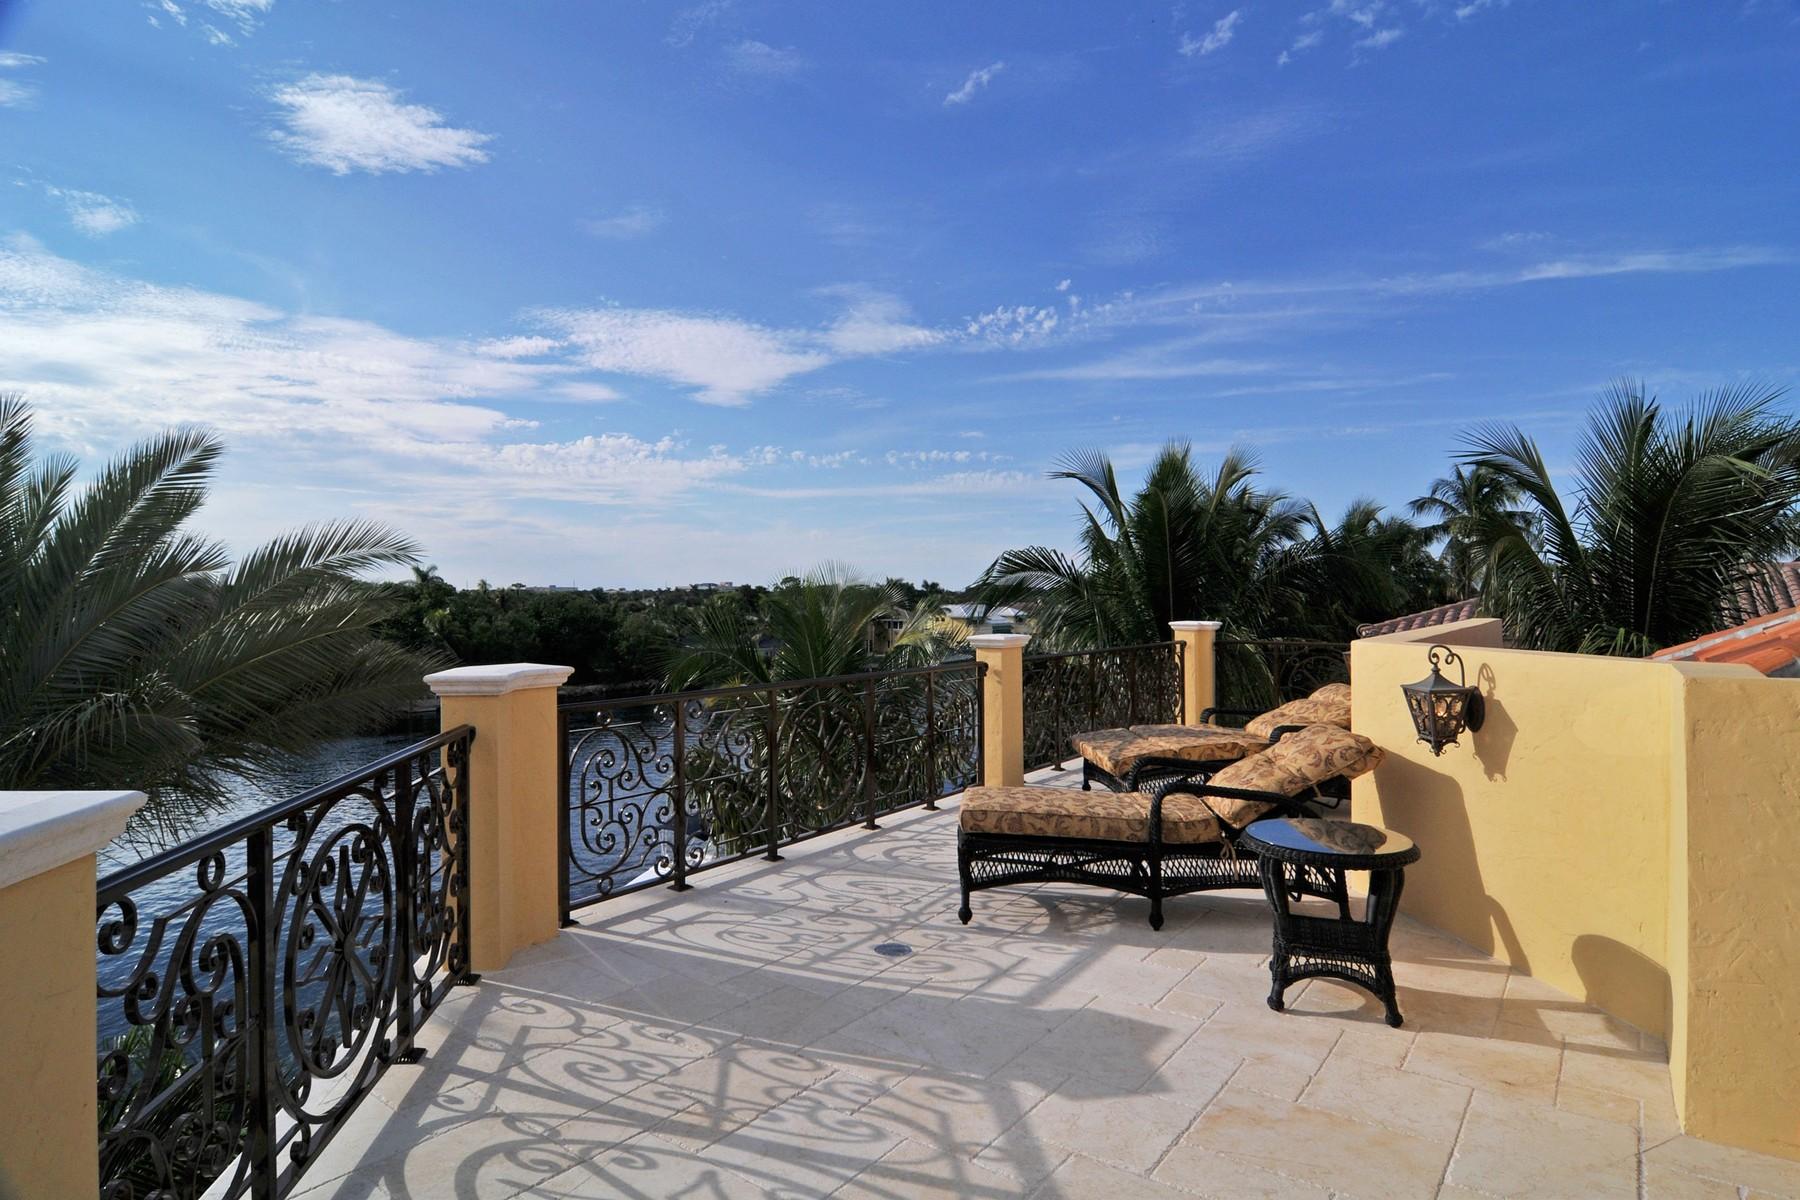 Additional photo for property listing at 299 NE Spanish Trl , Boca Raton, FL 33432  Boca Raton, Florida 33432 United States